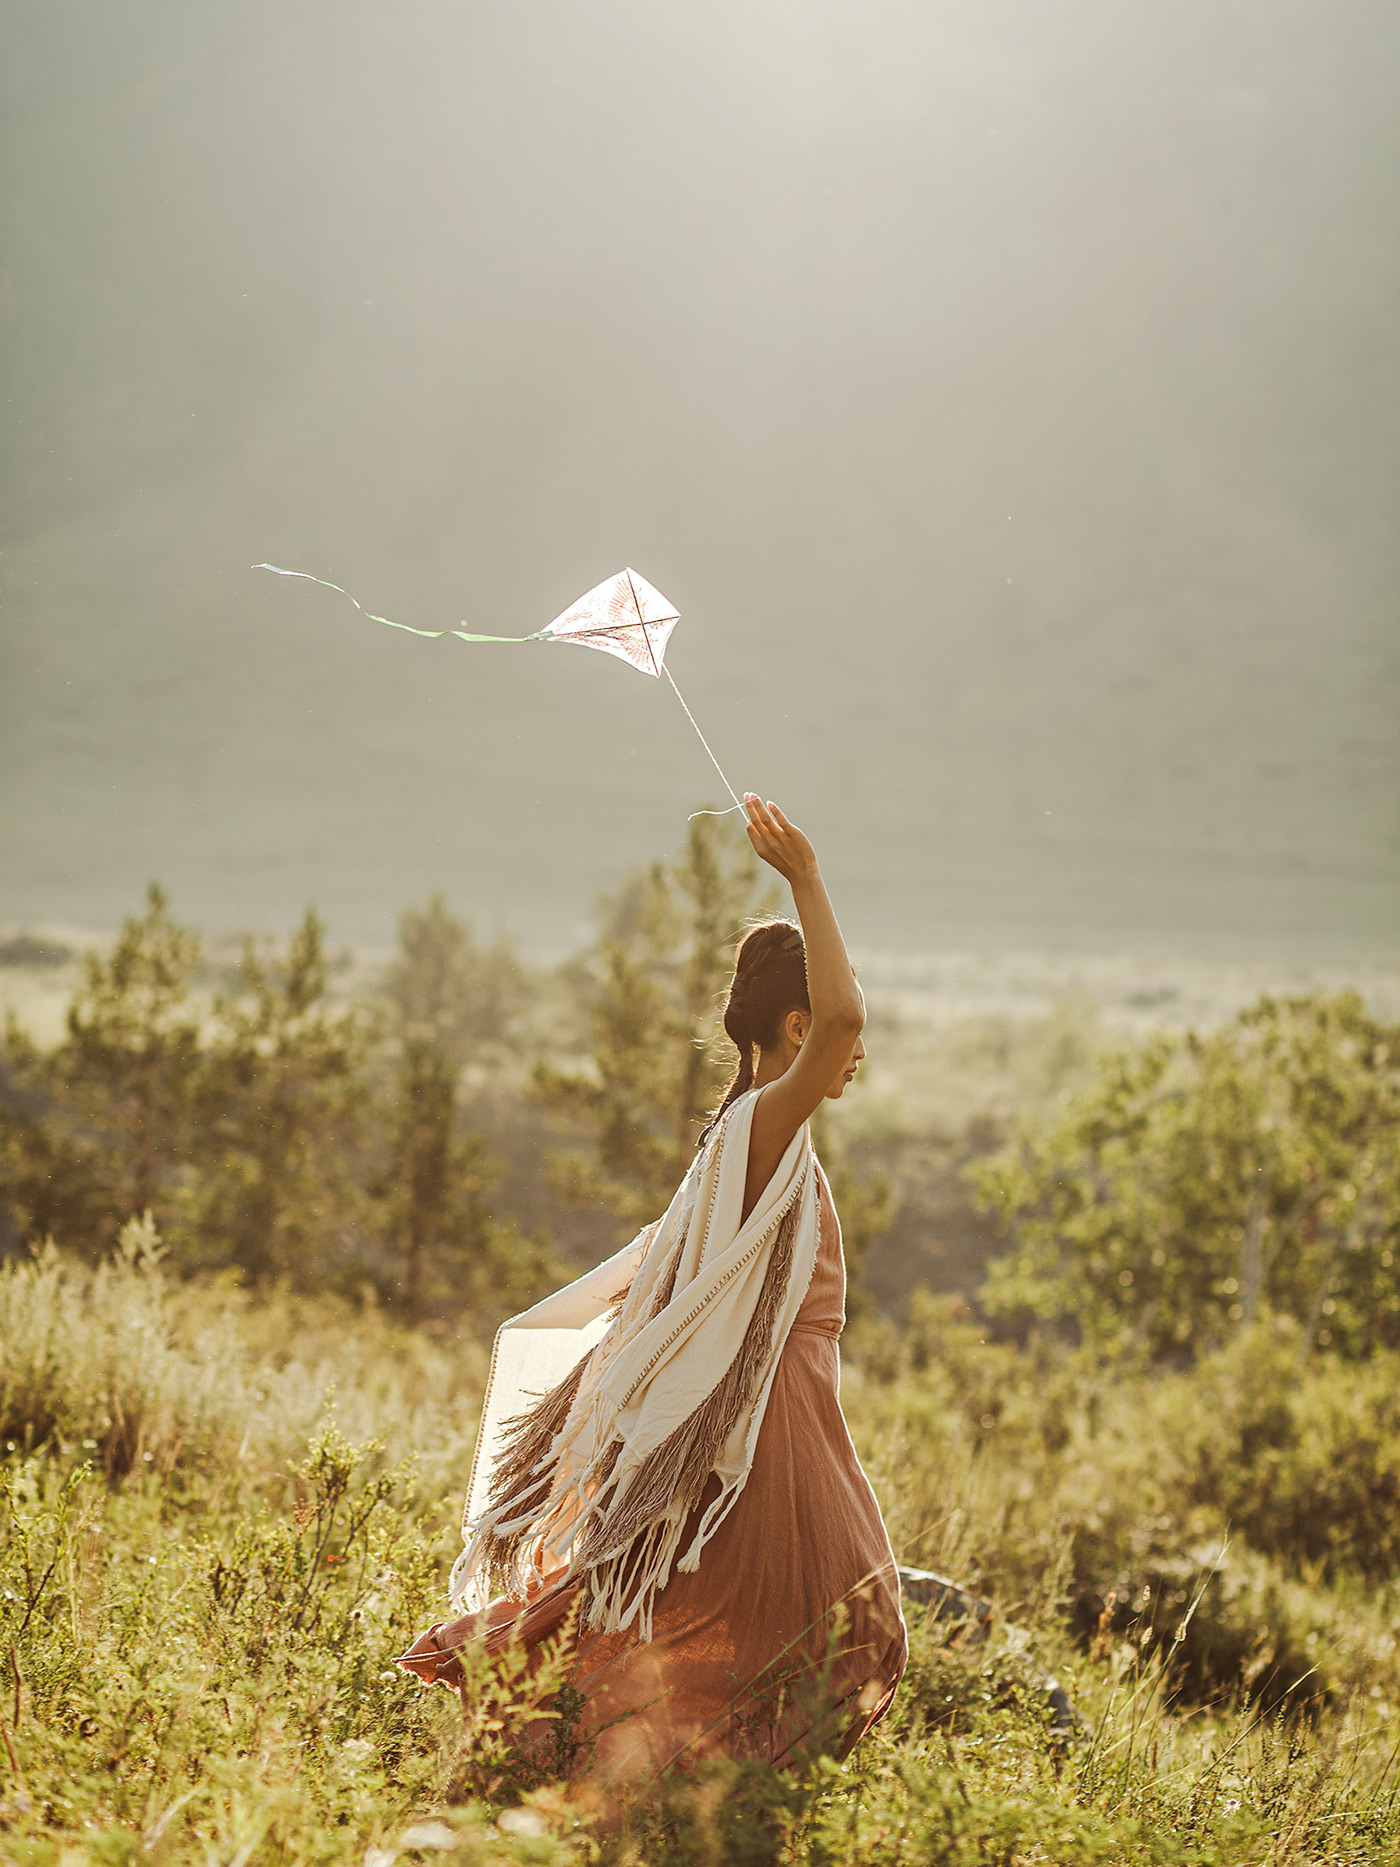 mountain spirit is inside you